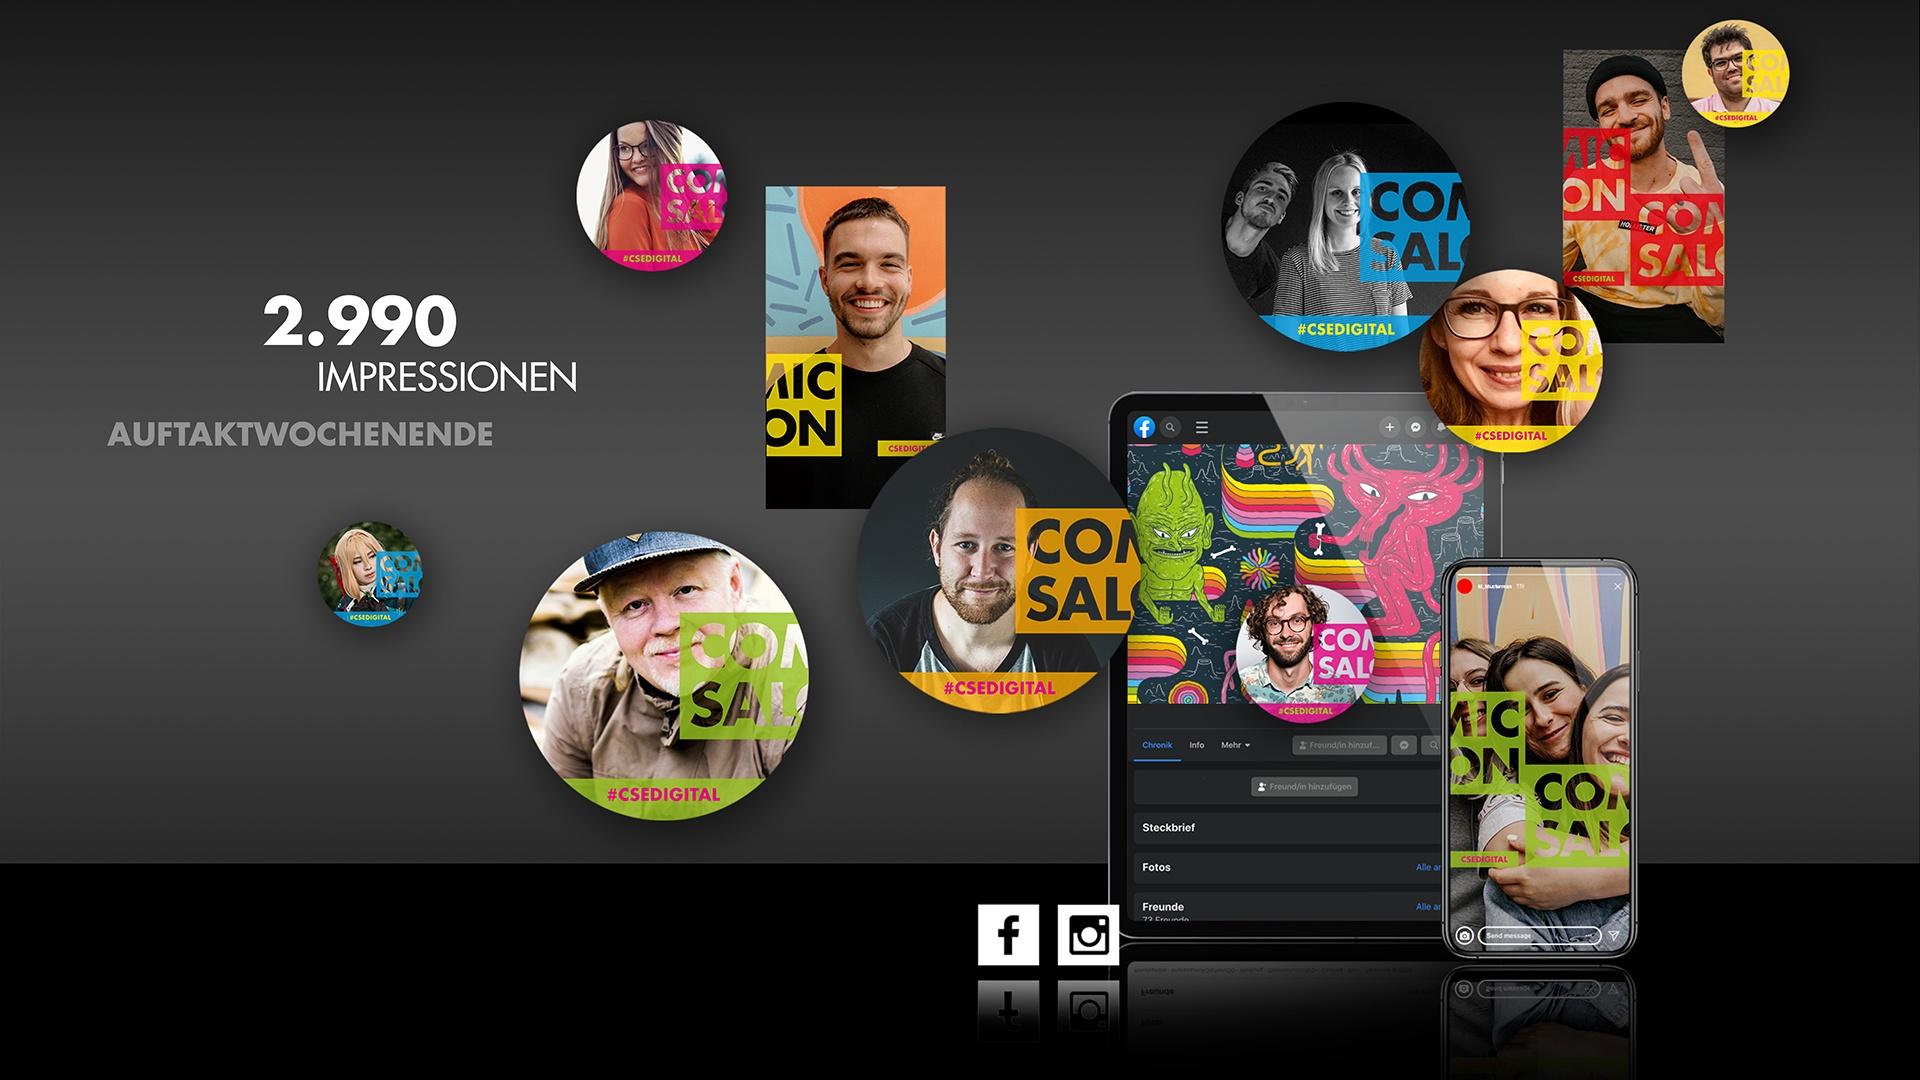 Digitaler Comic Salon 2020 #CSEDIGITAL